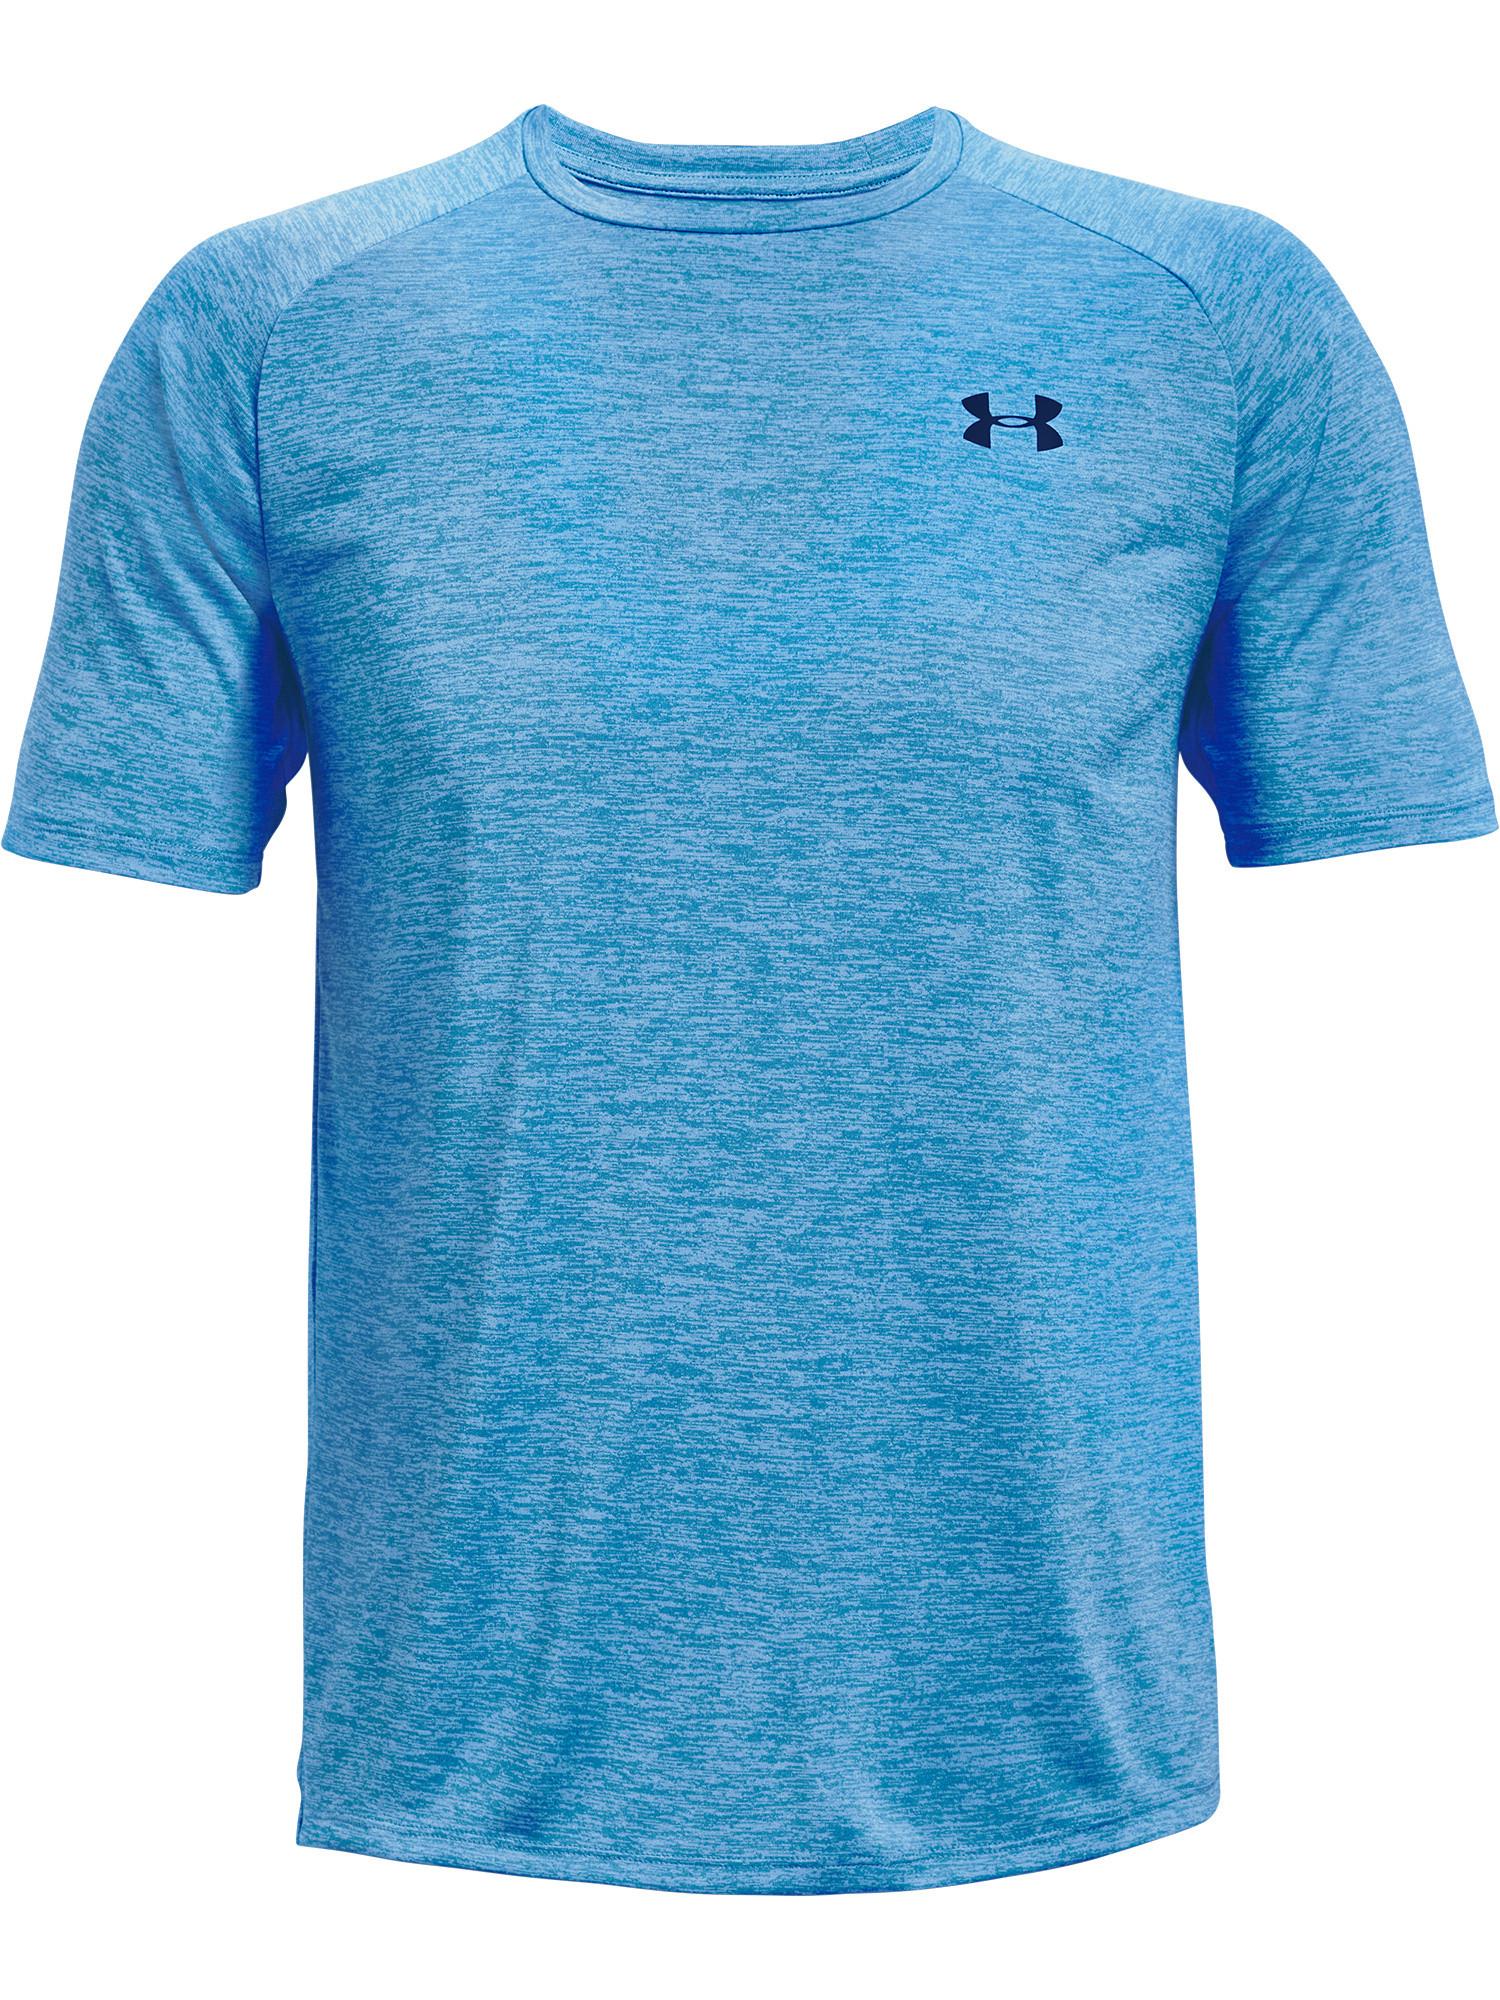 T-shirt a manica corta Tech, Blu, large image number 0